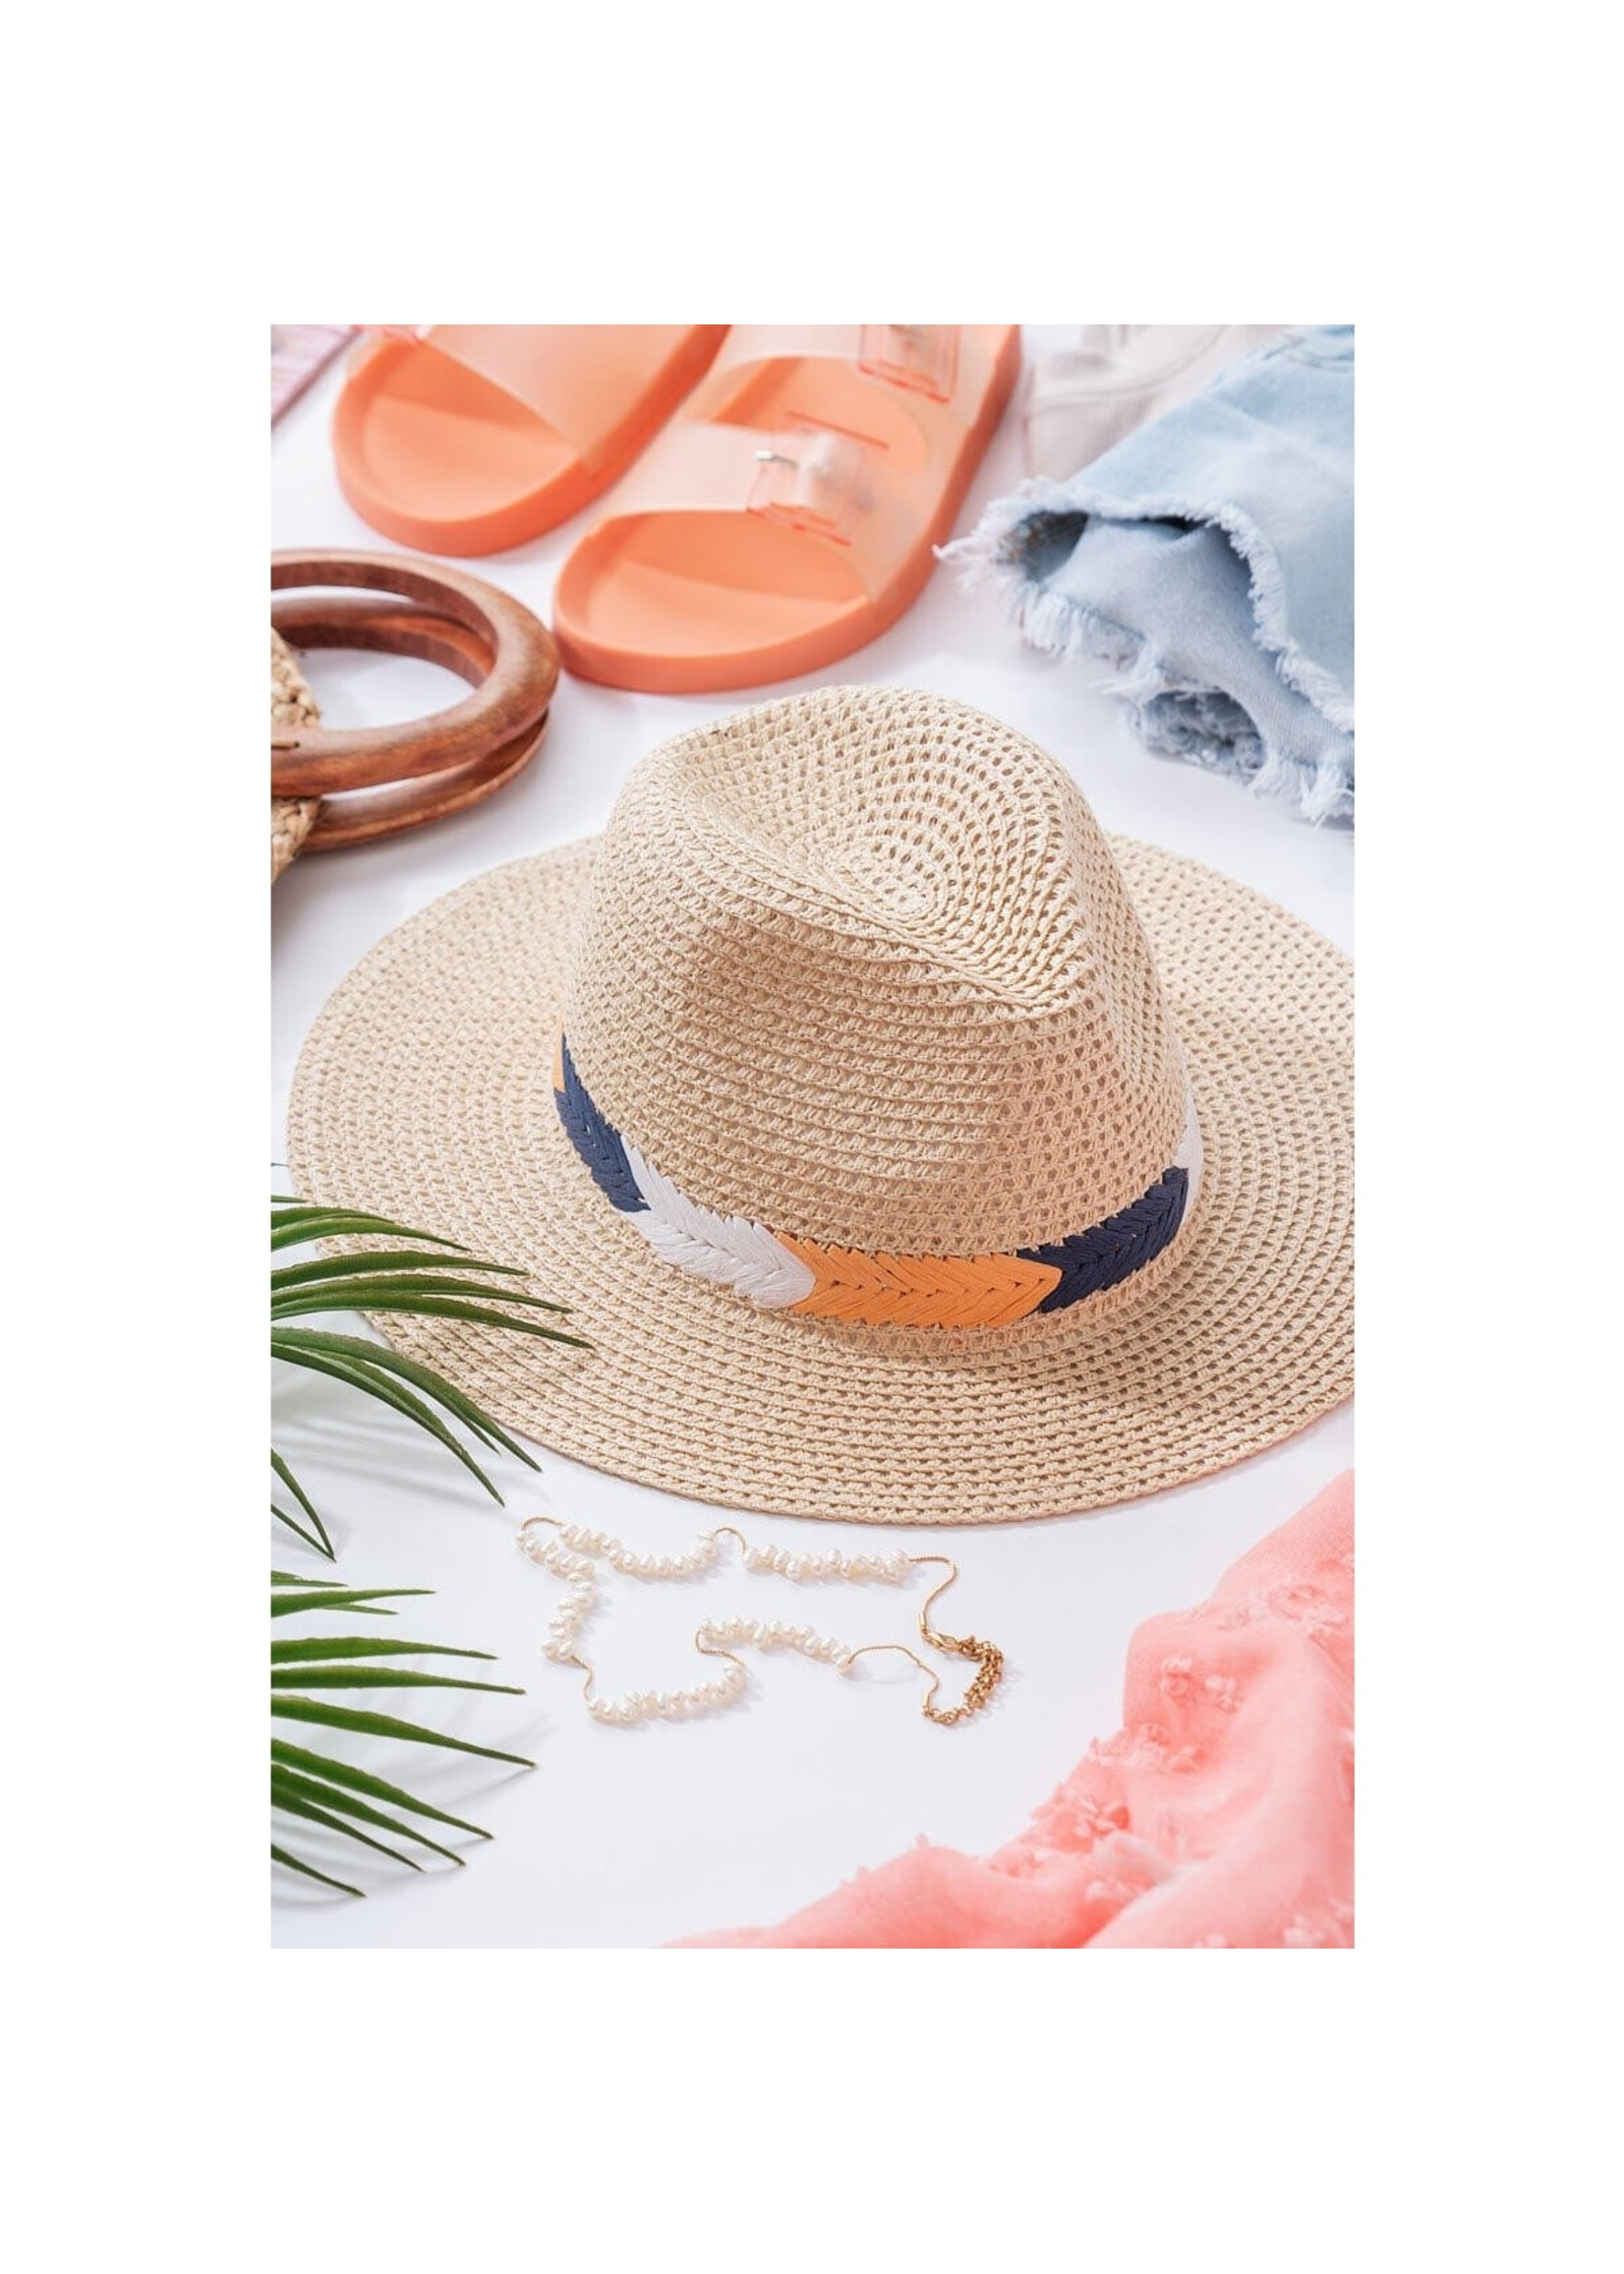 Urban Daizy Weaved Boho Panama Hat